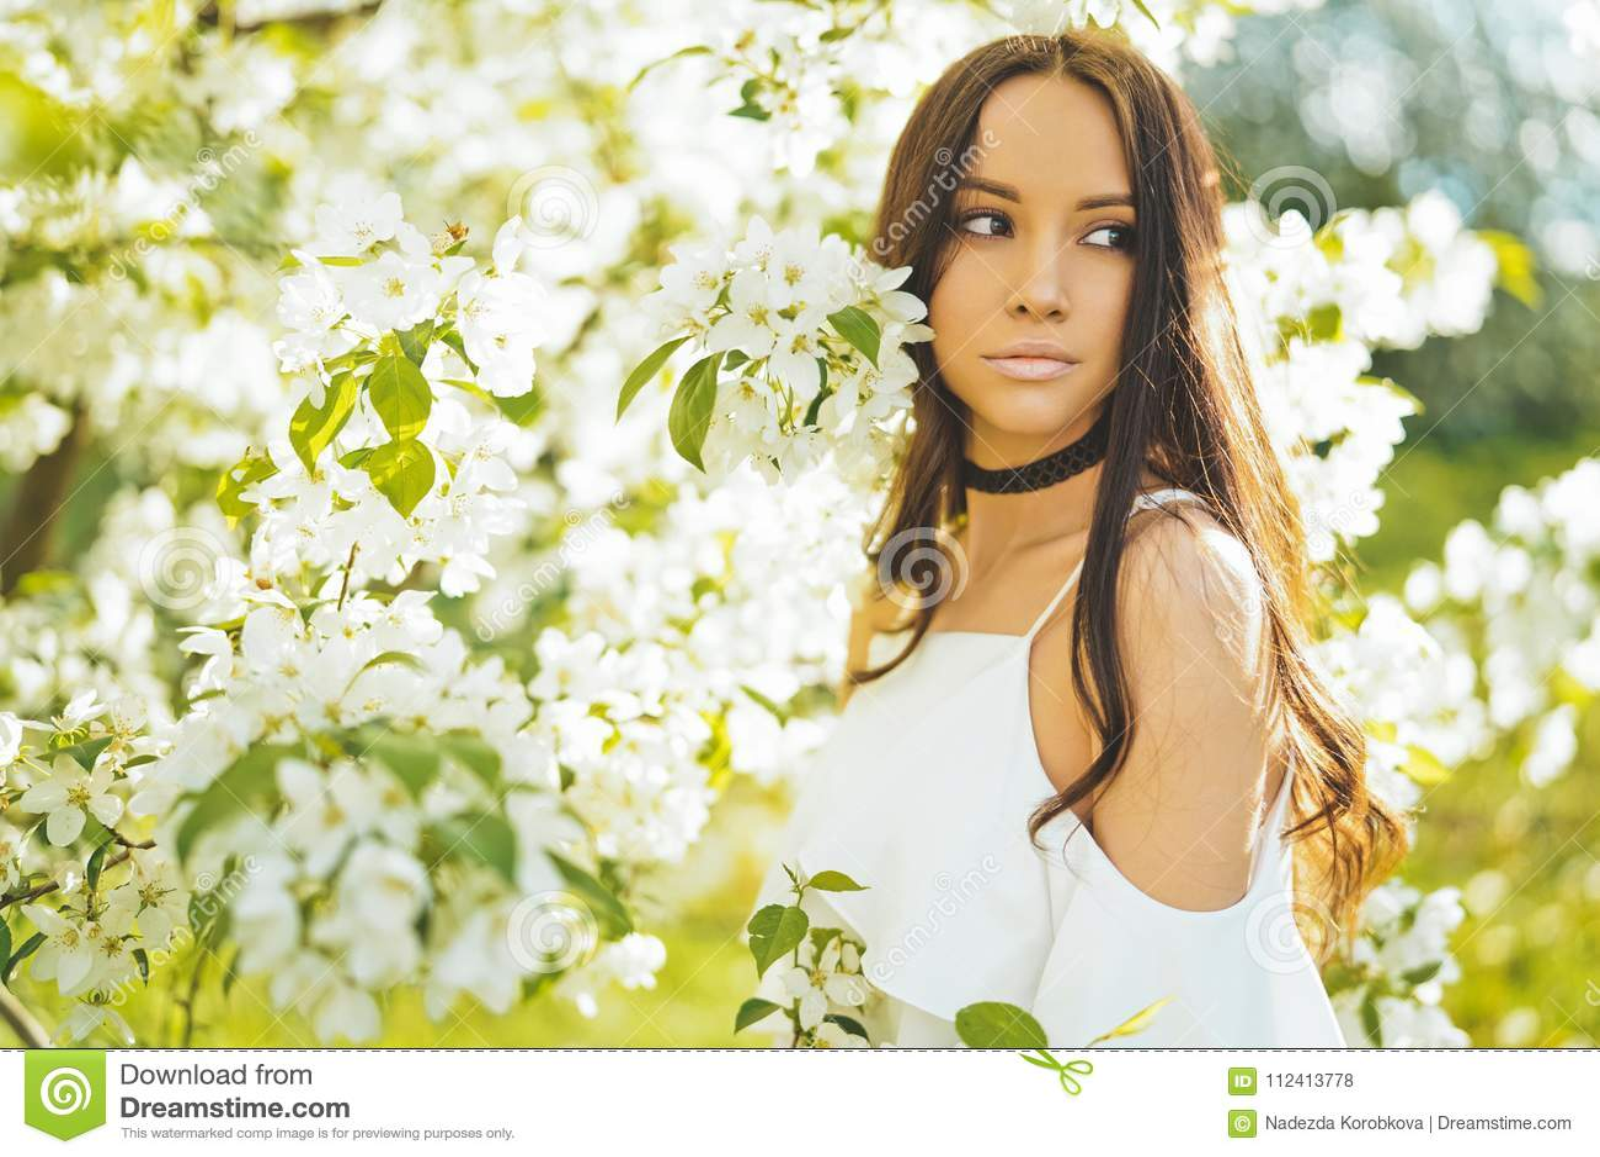 0babbaf5a20 Όμορφη νέα γυναίκα που περιβάλλεται από τα λουλούδια του Apple ...